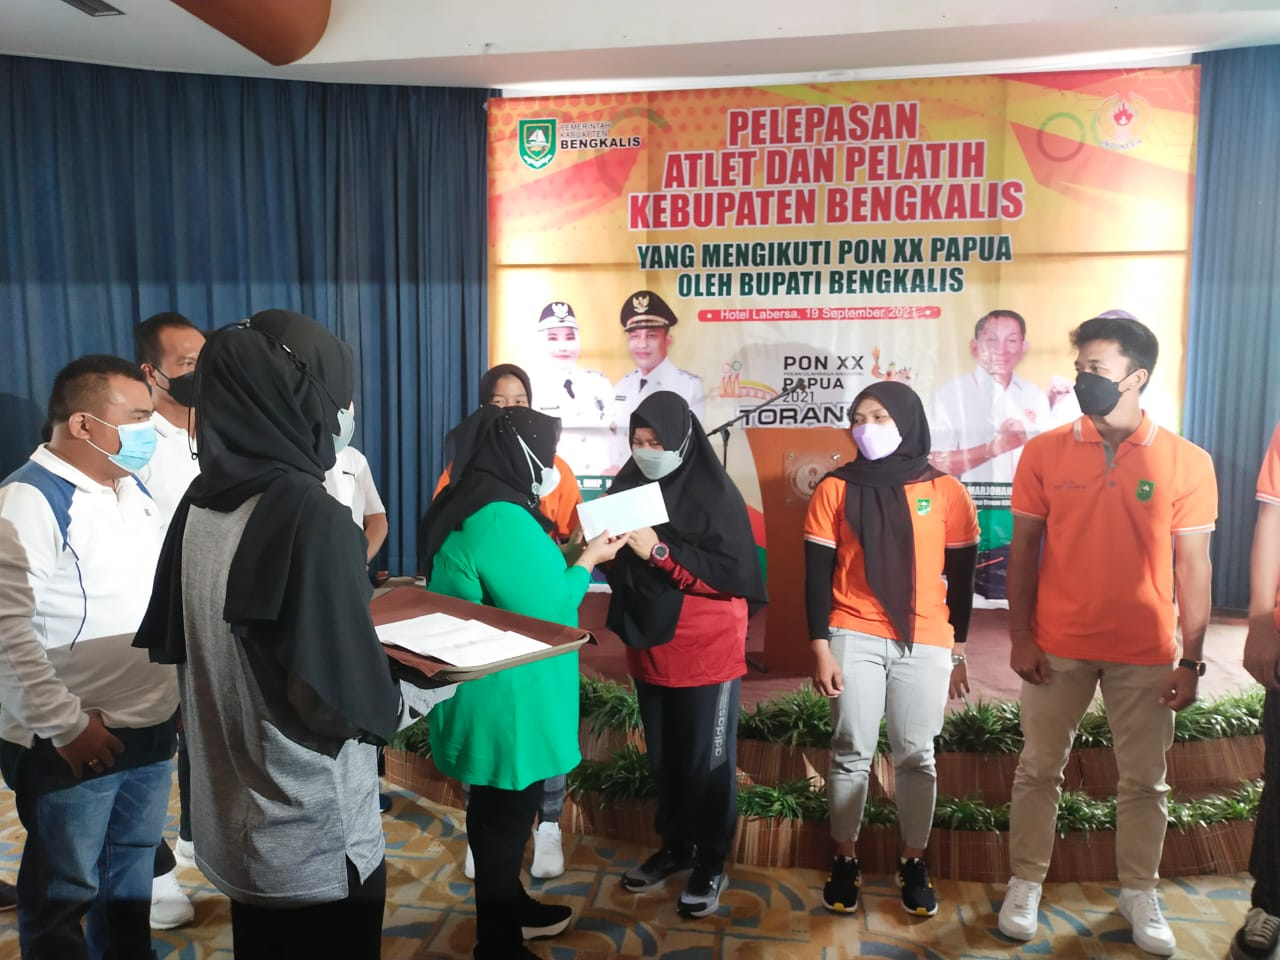 Bupati Bengkalis Lepas 43 Atlet ke PON XX Papua